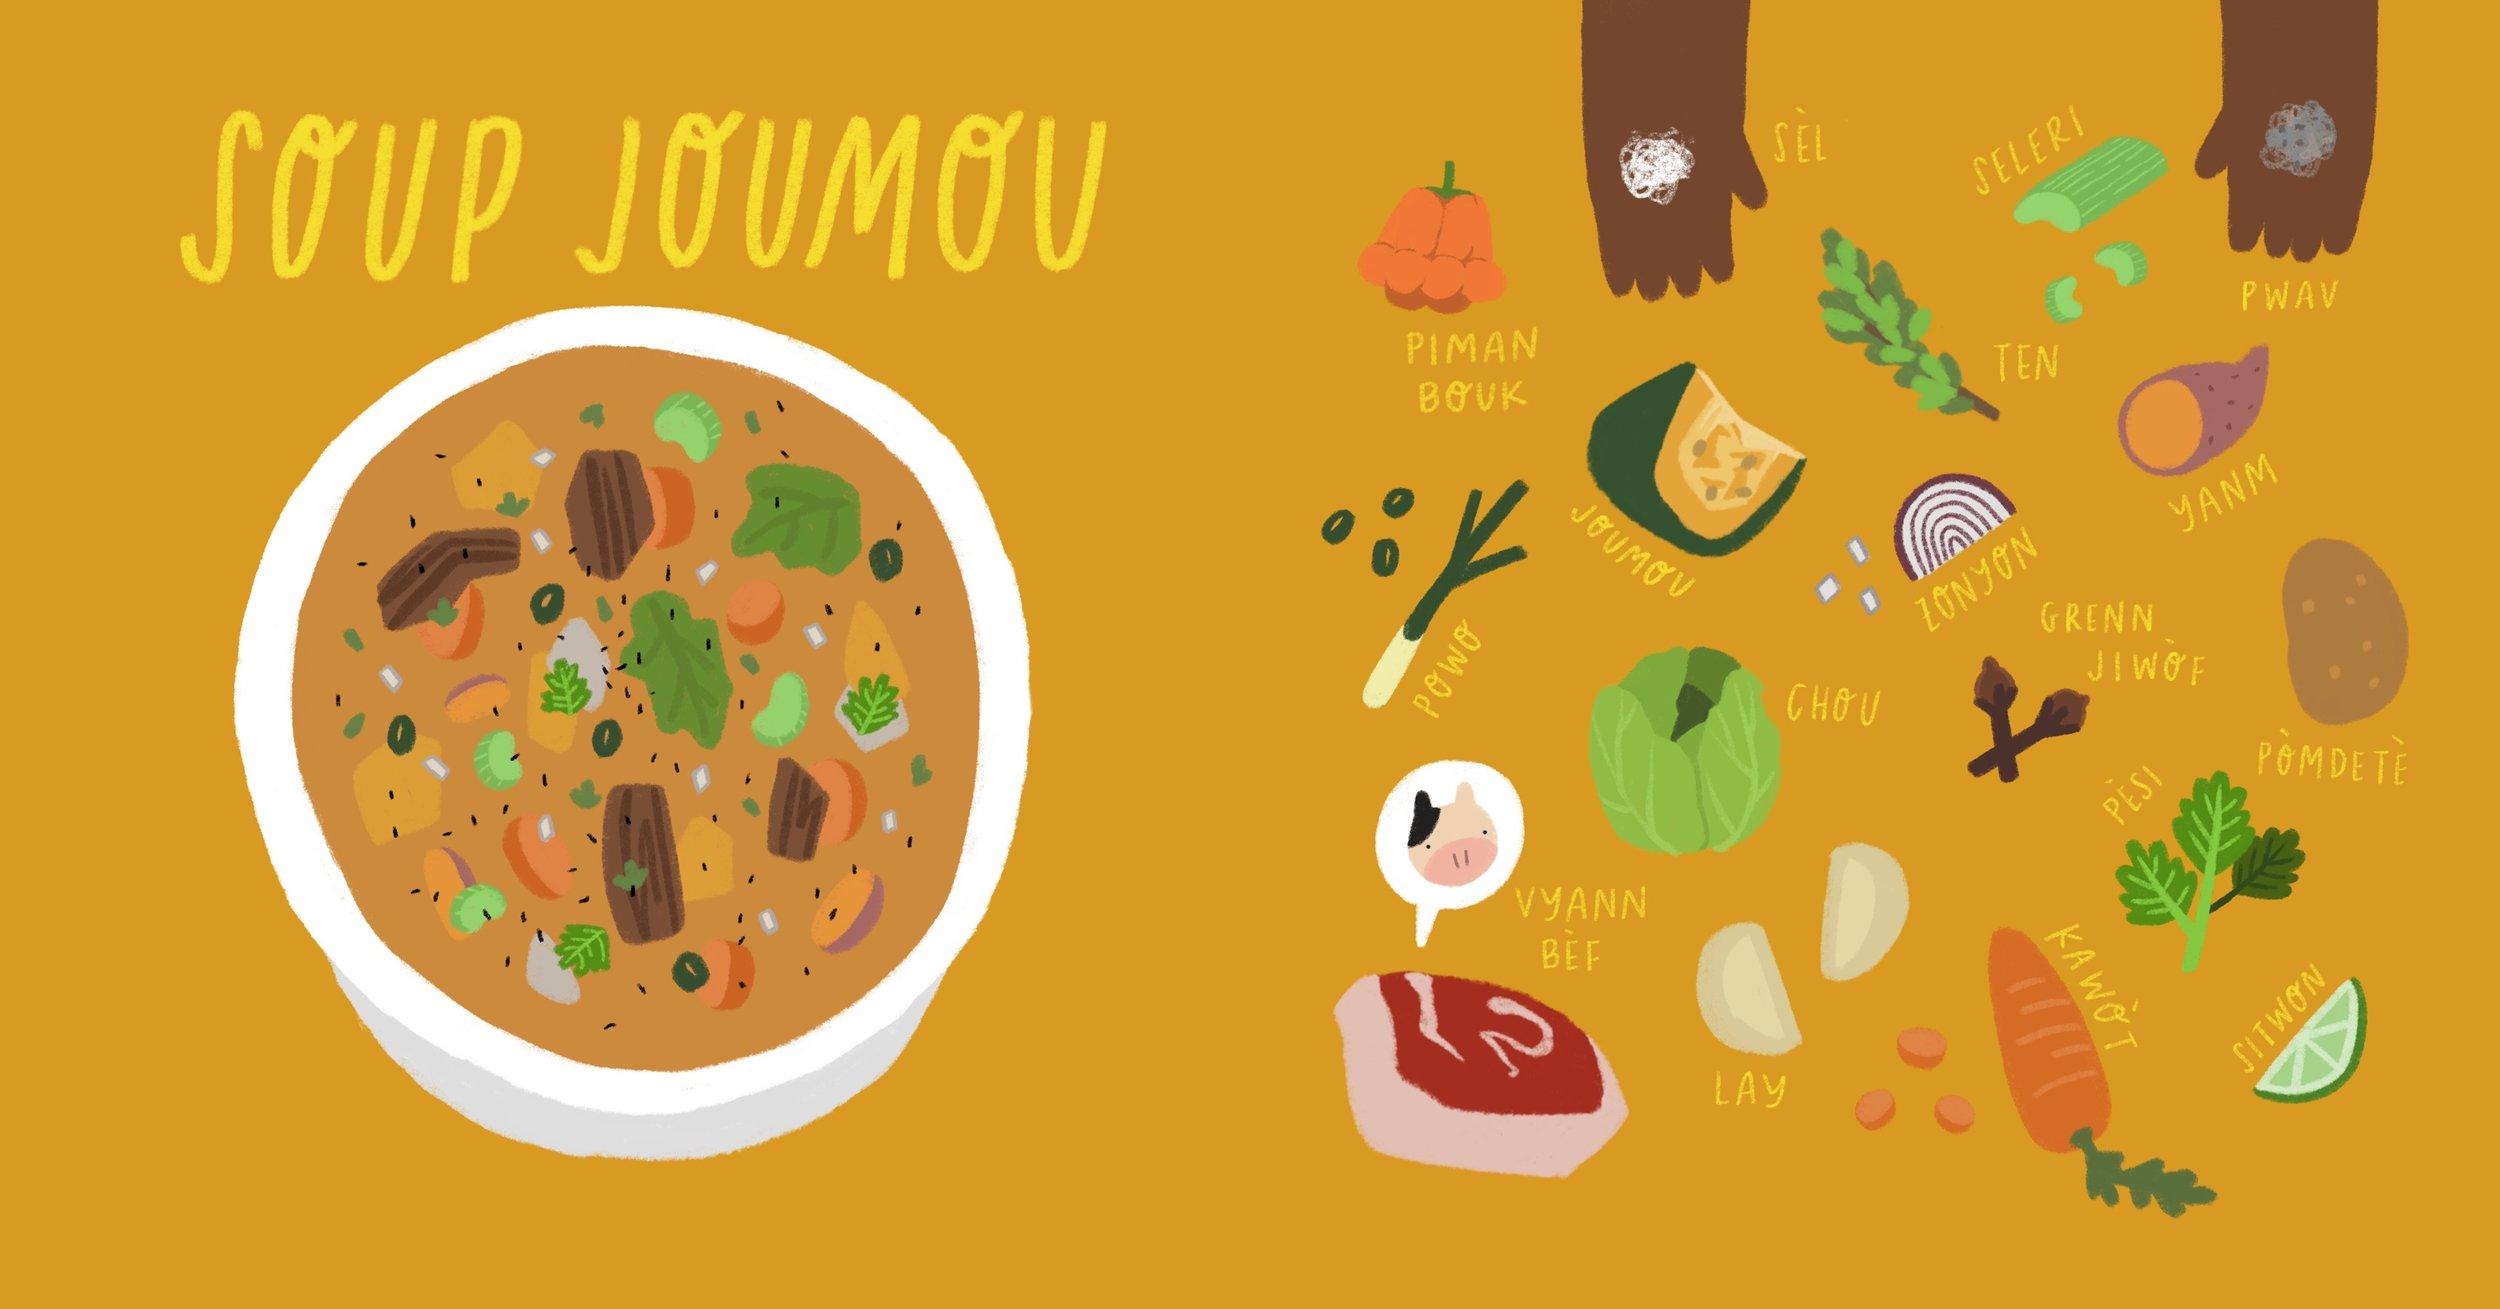 soup joumou_edit.jpg